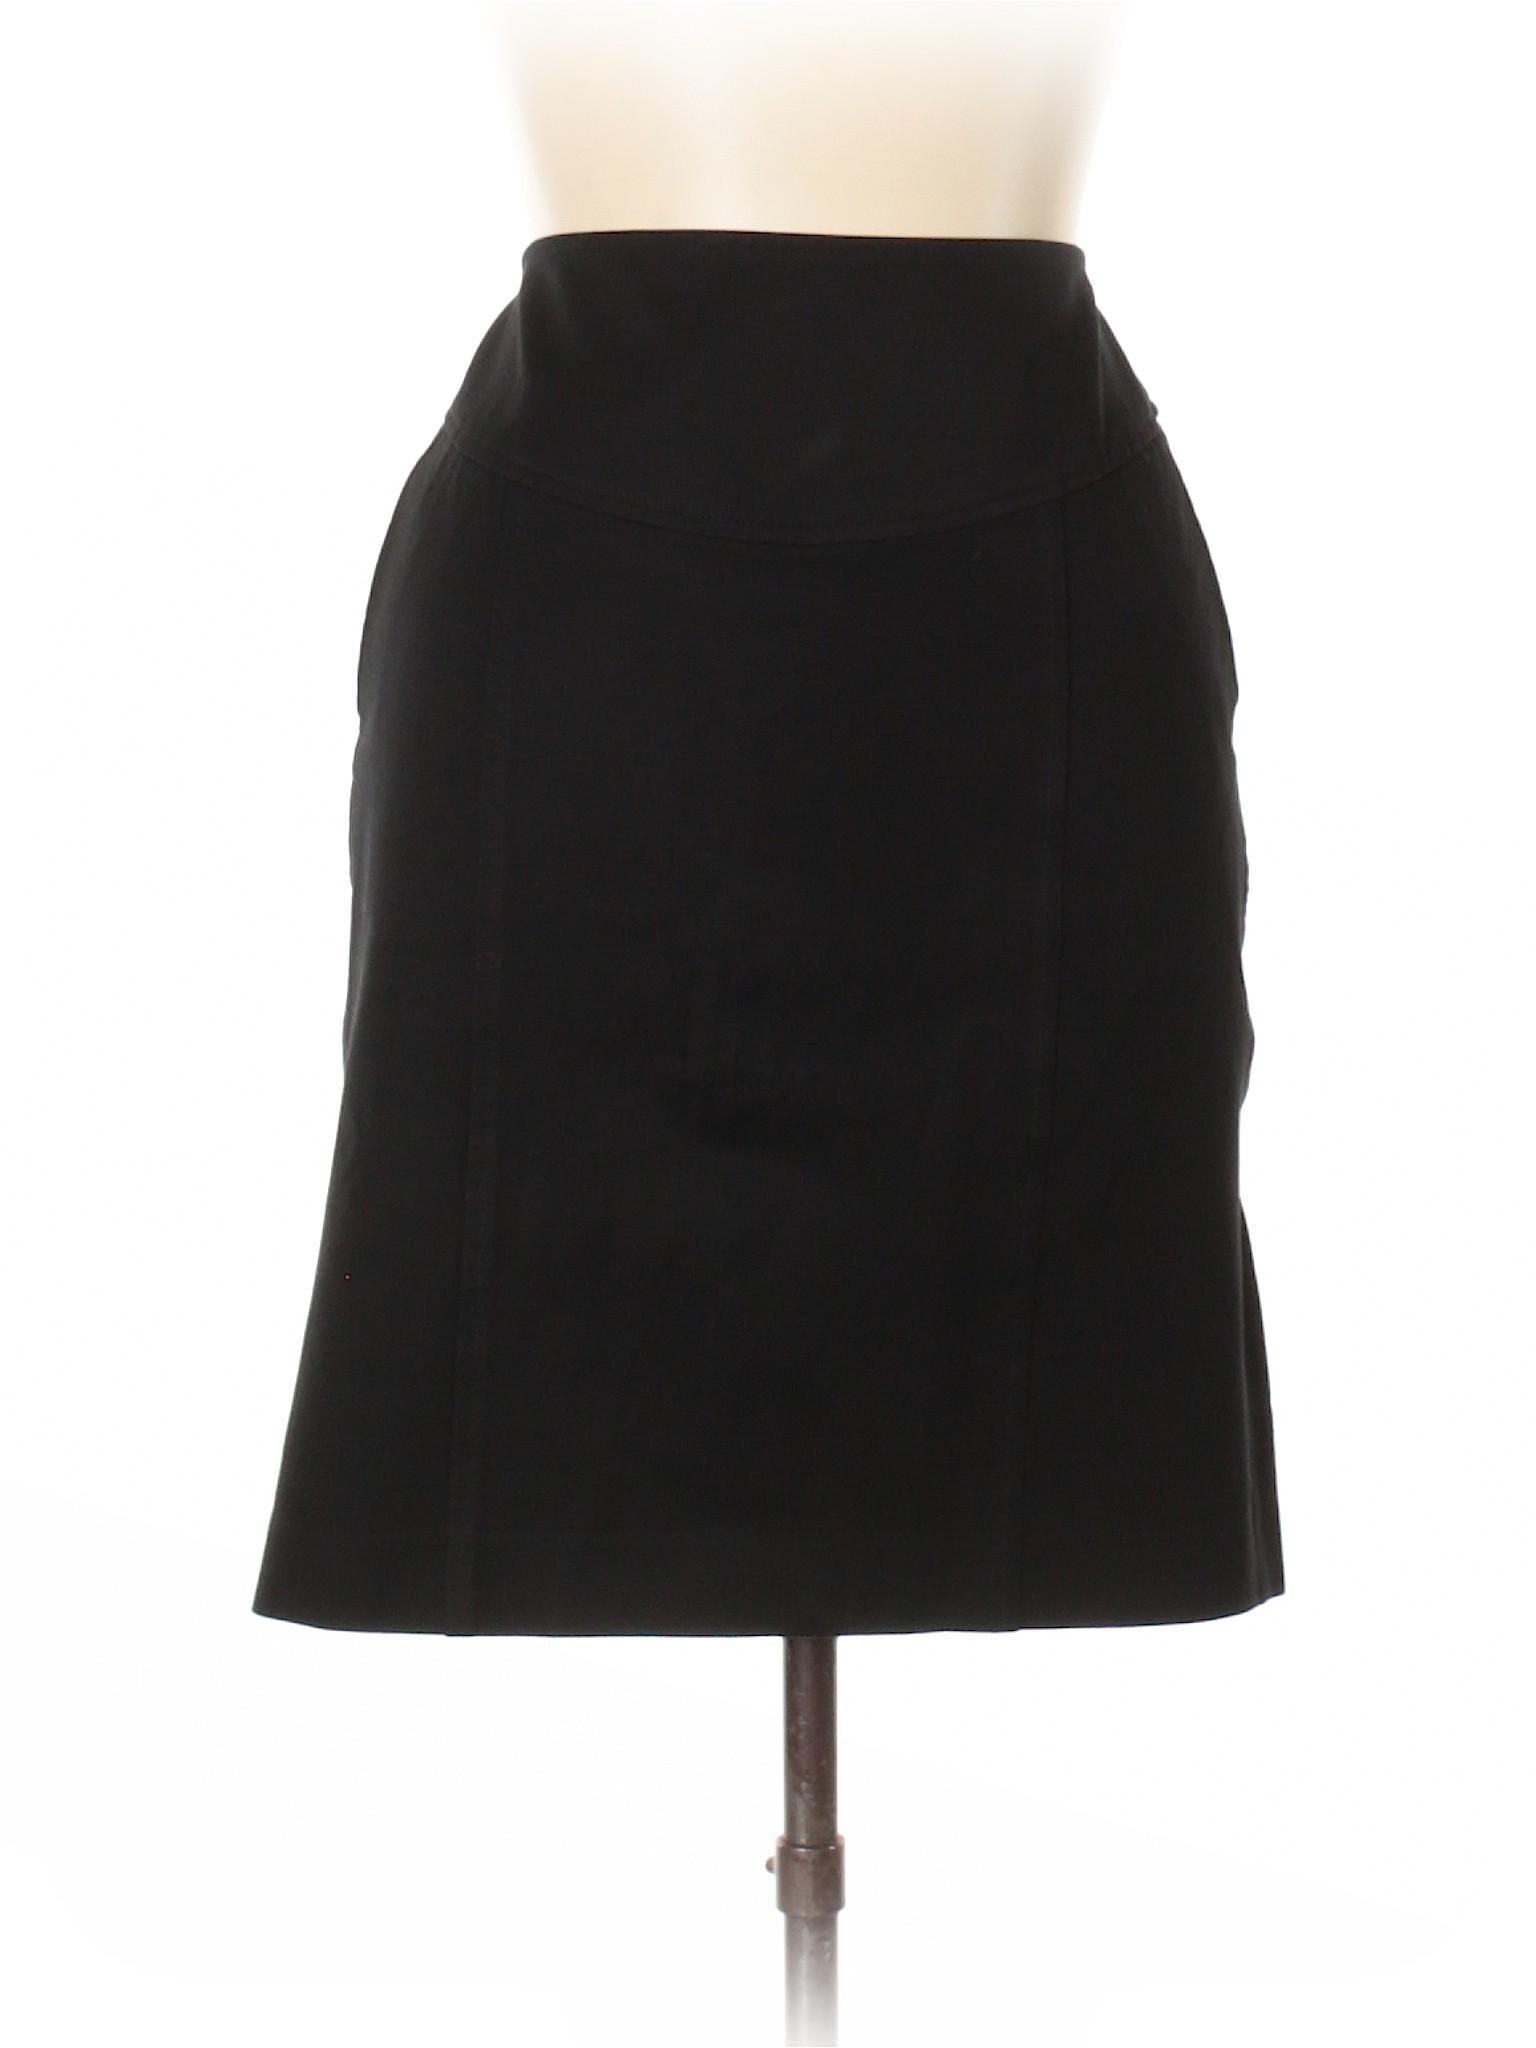 Boutique Republic Skirt Casual leisure Banana nAqrAaSU